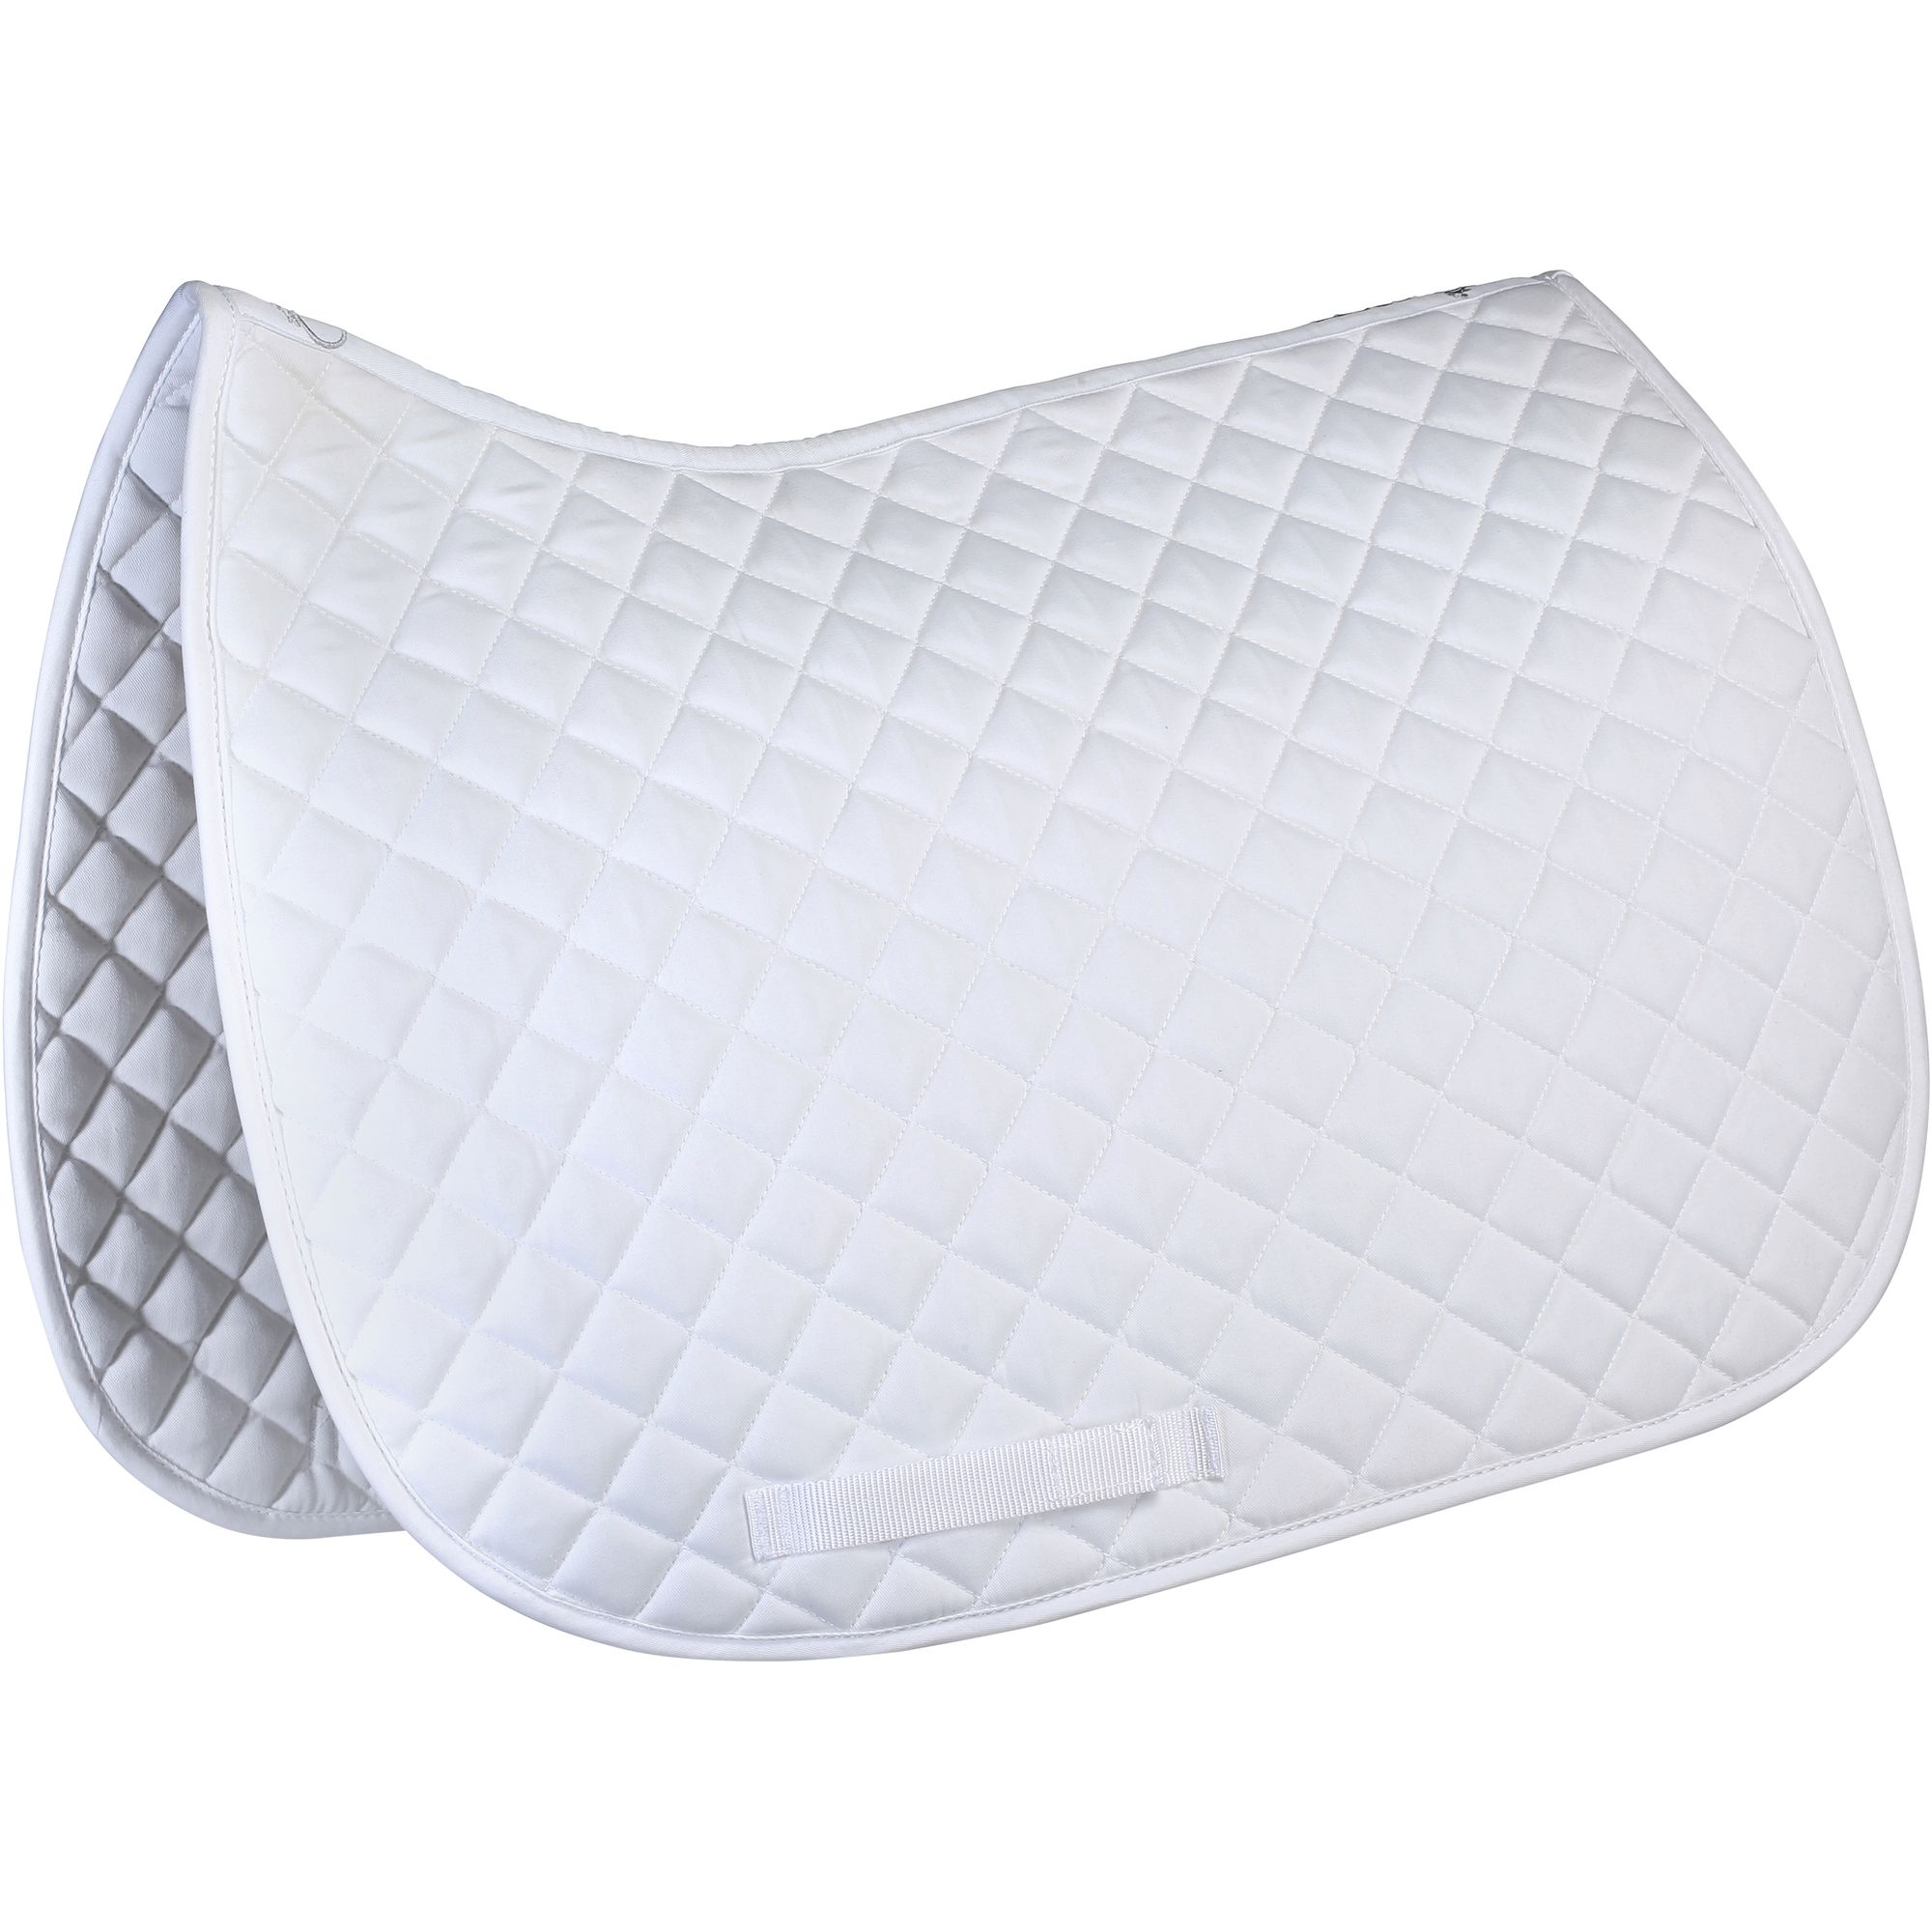 tapis de selle quitation schooling blanc taille poney. Black Bedroom Furniture Sets. Home Design Ideas